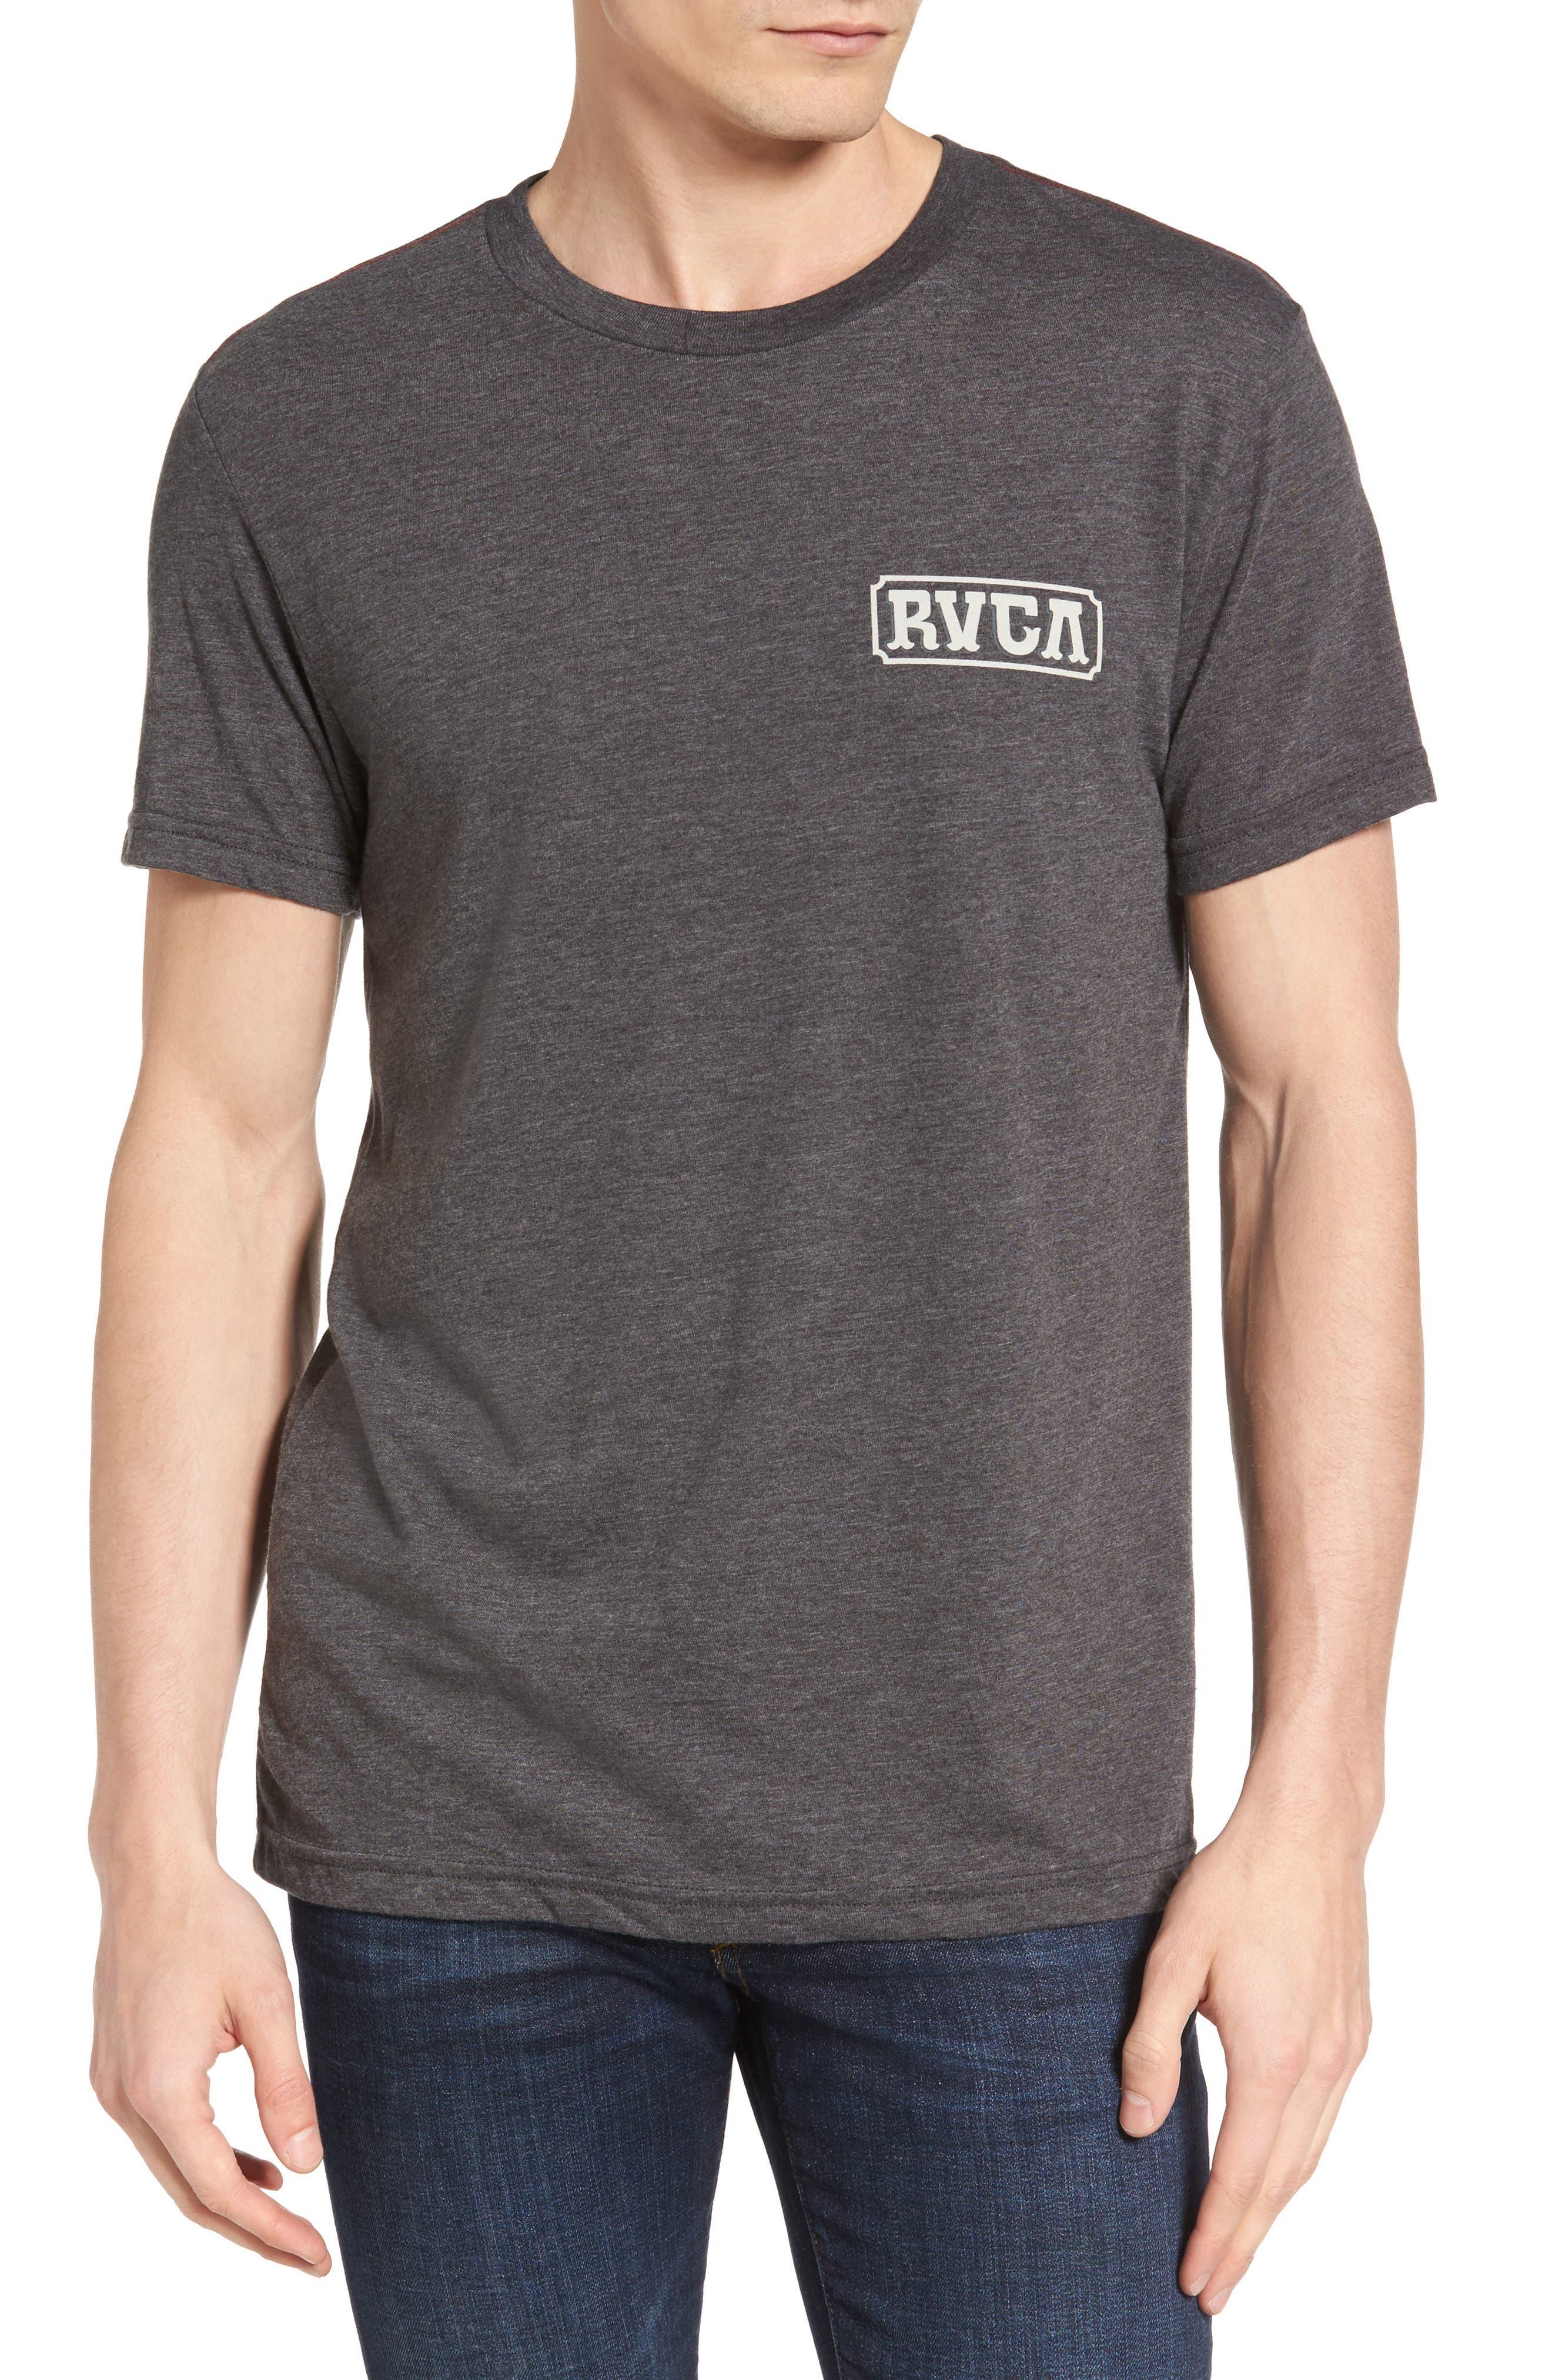 RVCA Suzuki Sign Graphic T-Shirt